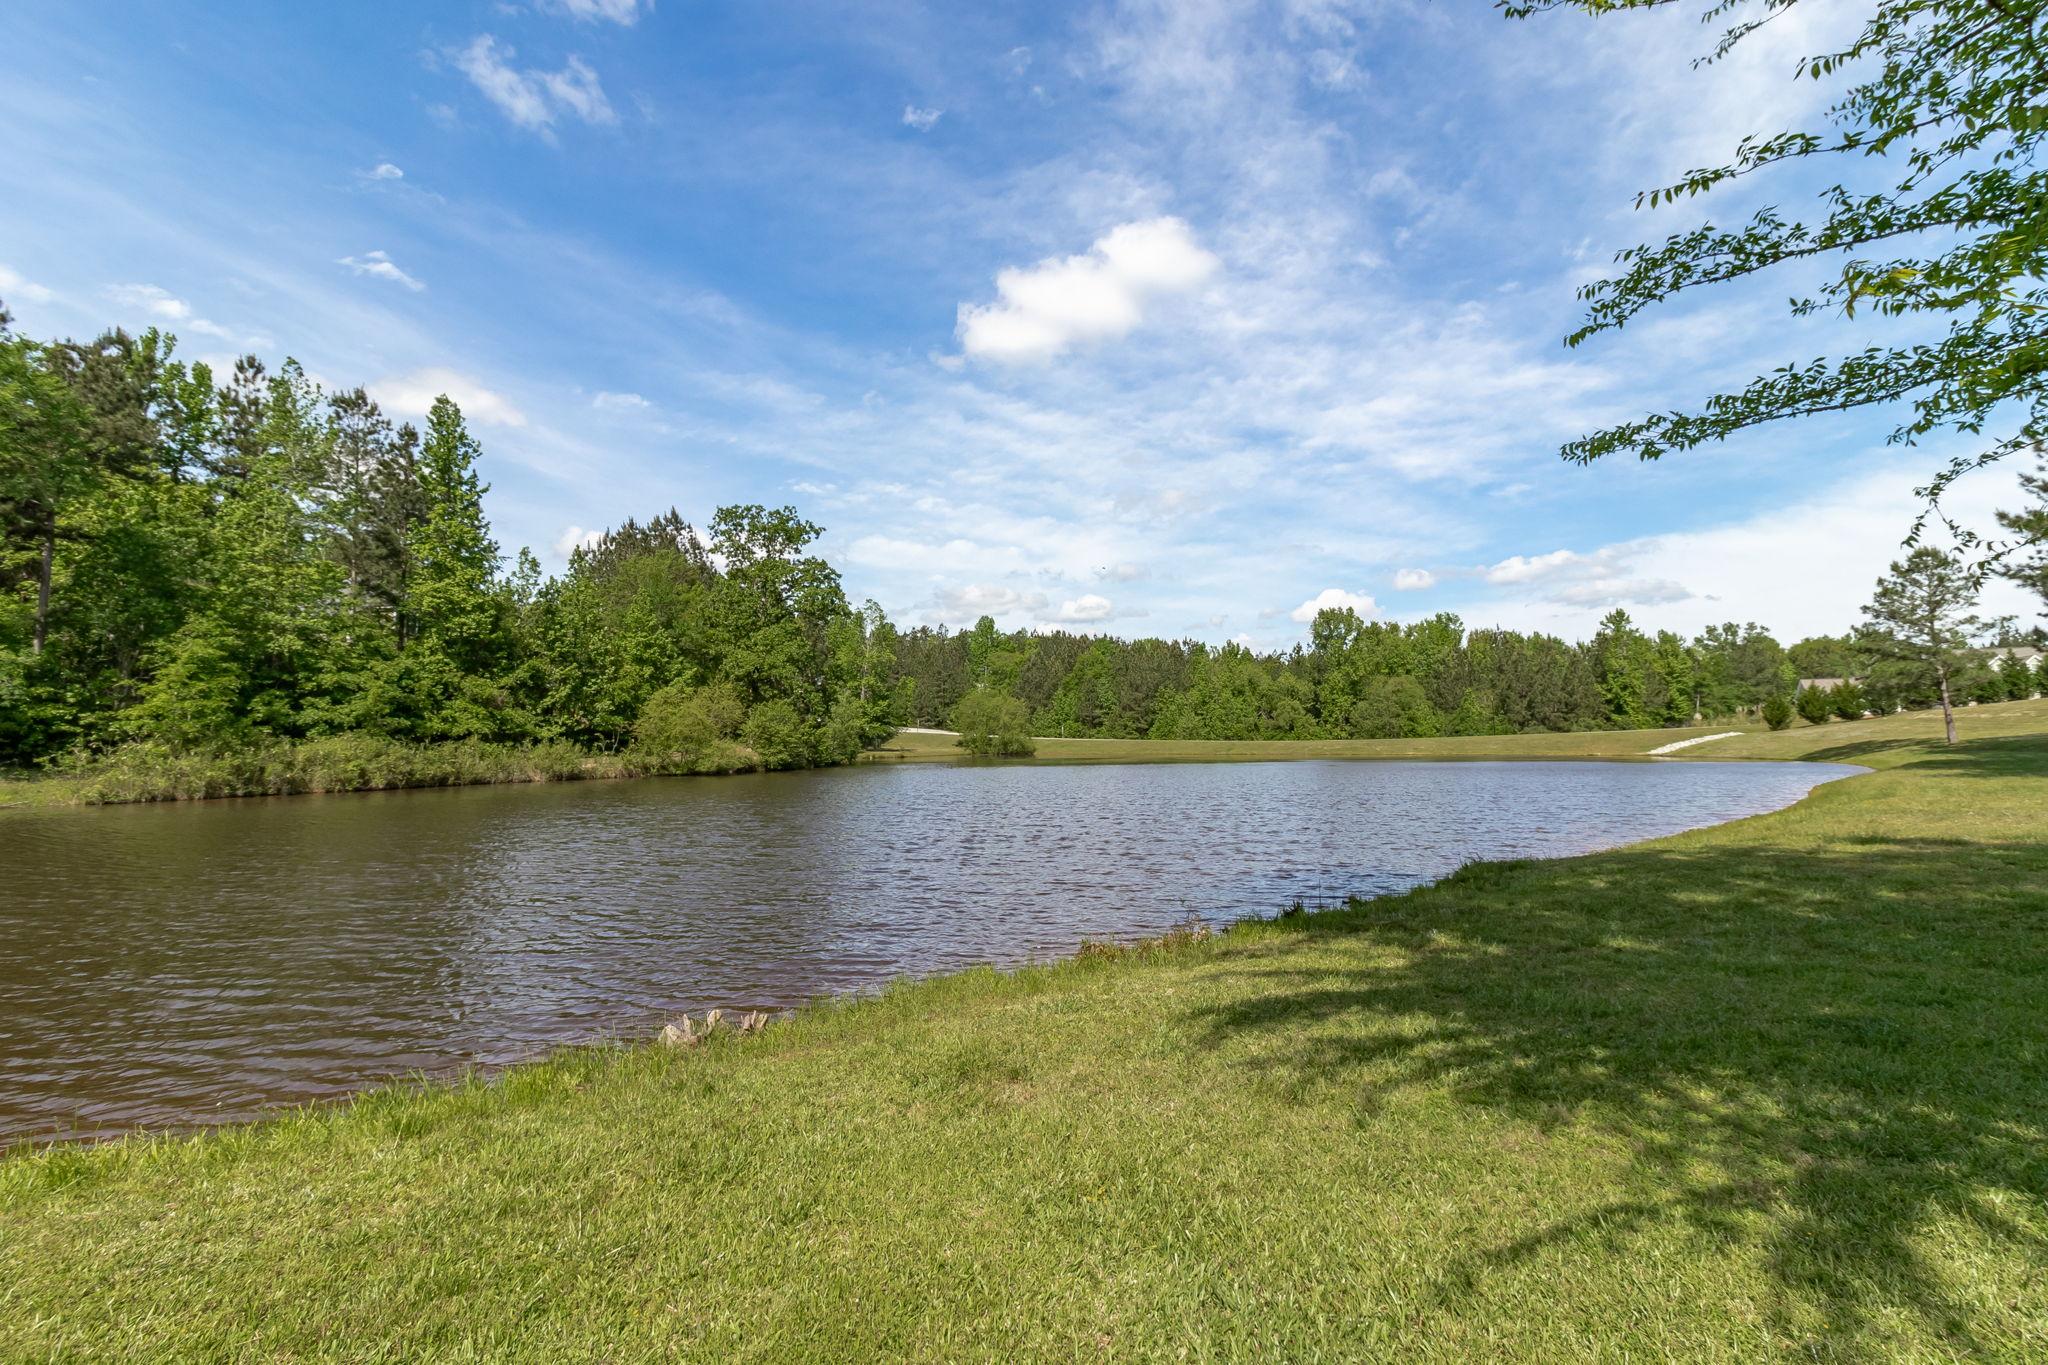 Backyard - Pond